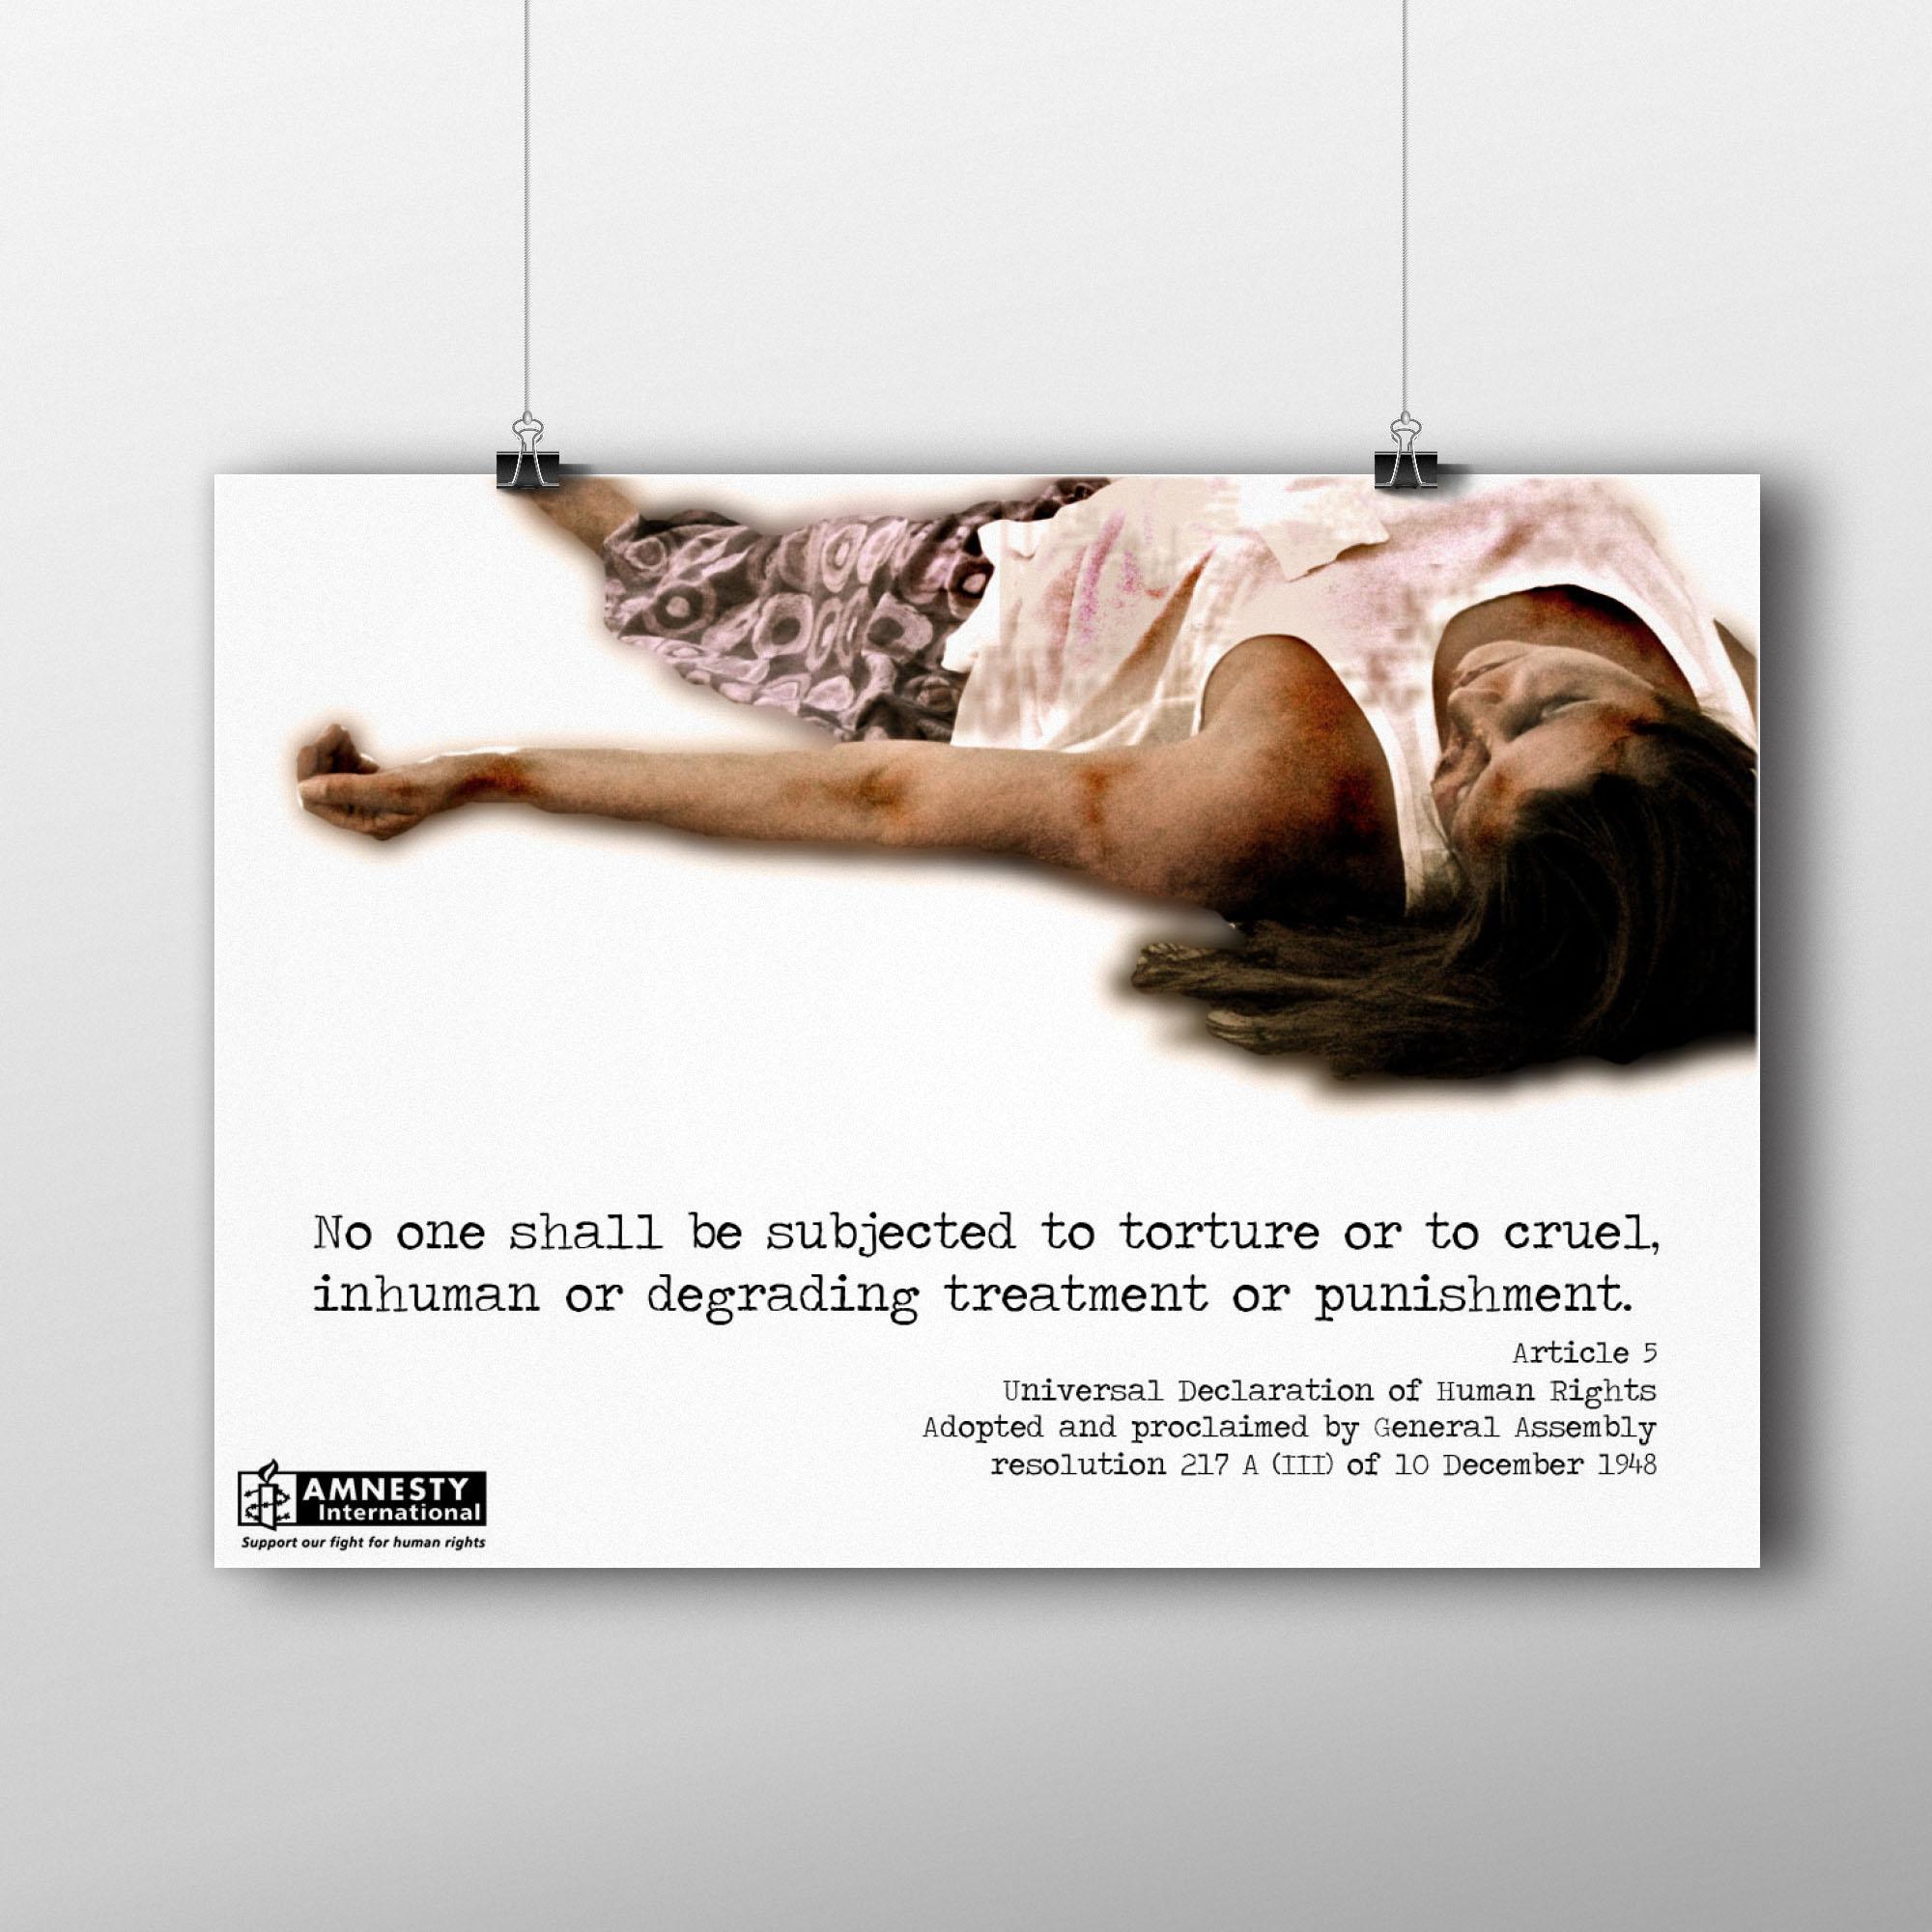 human rights2.jpg